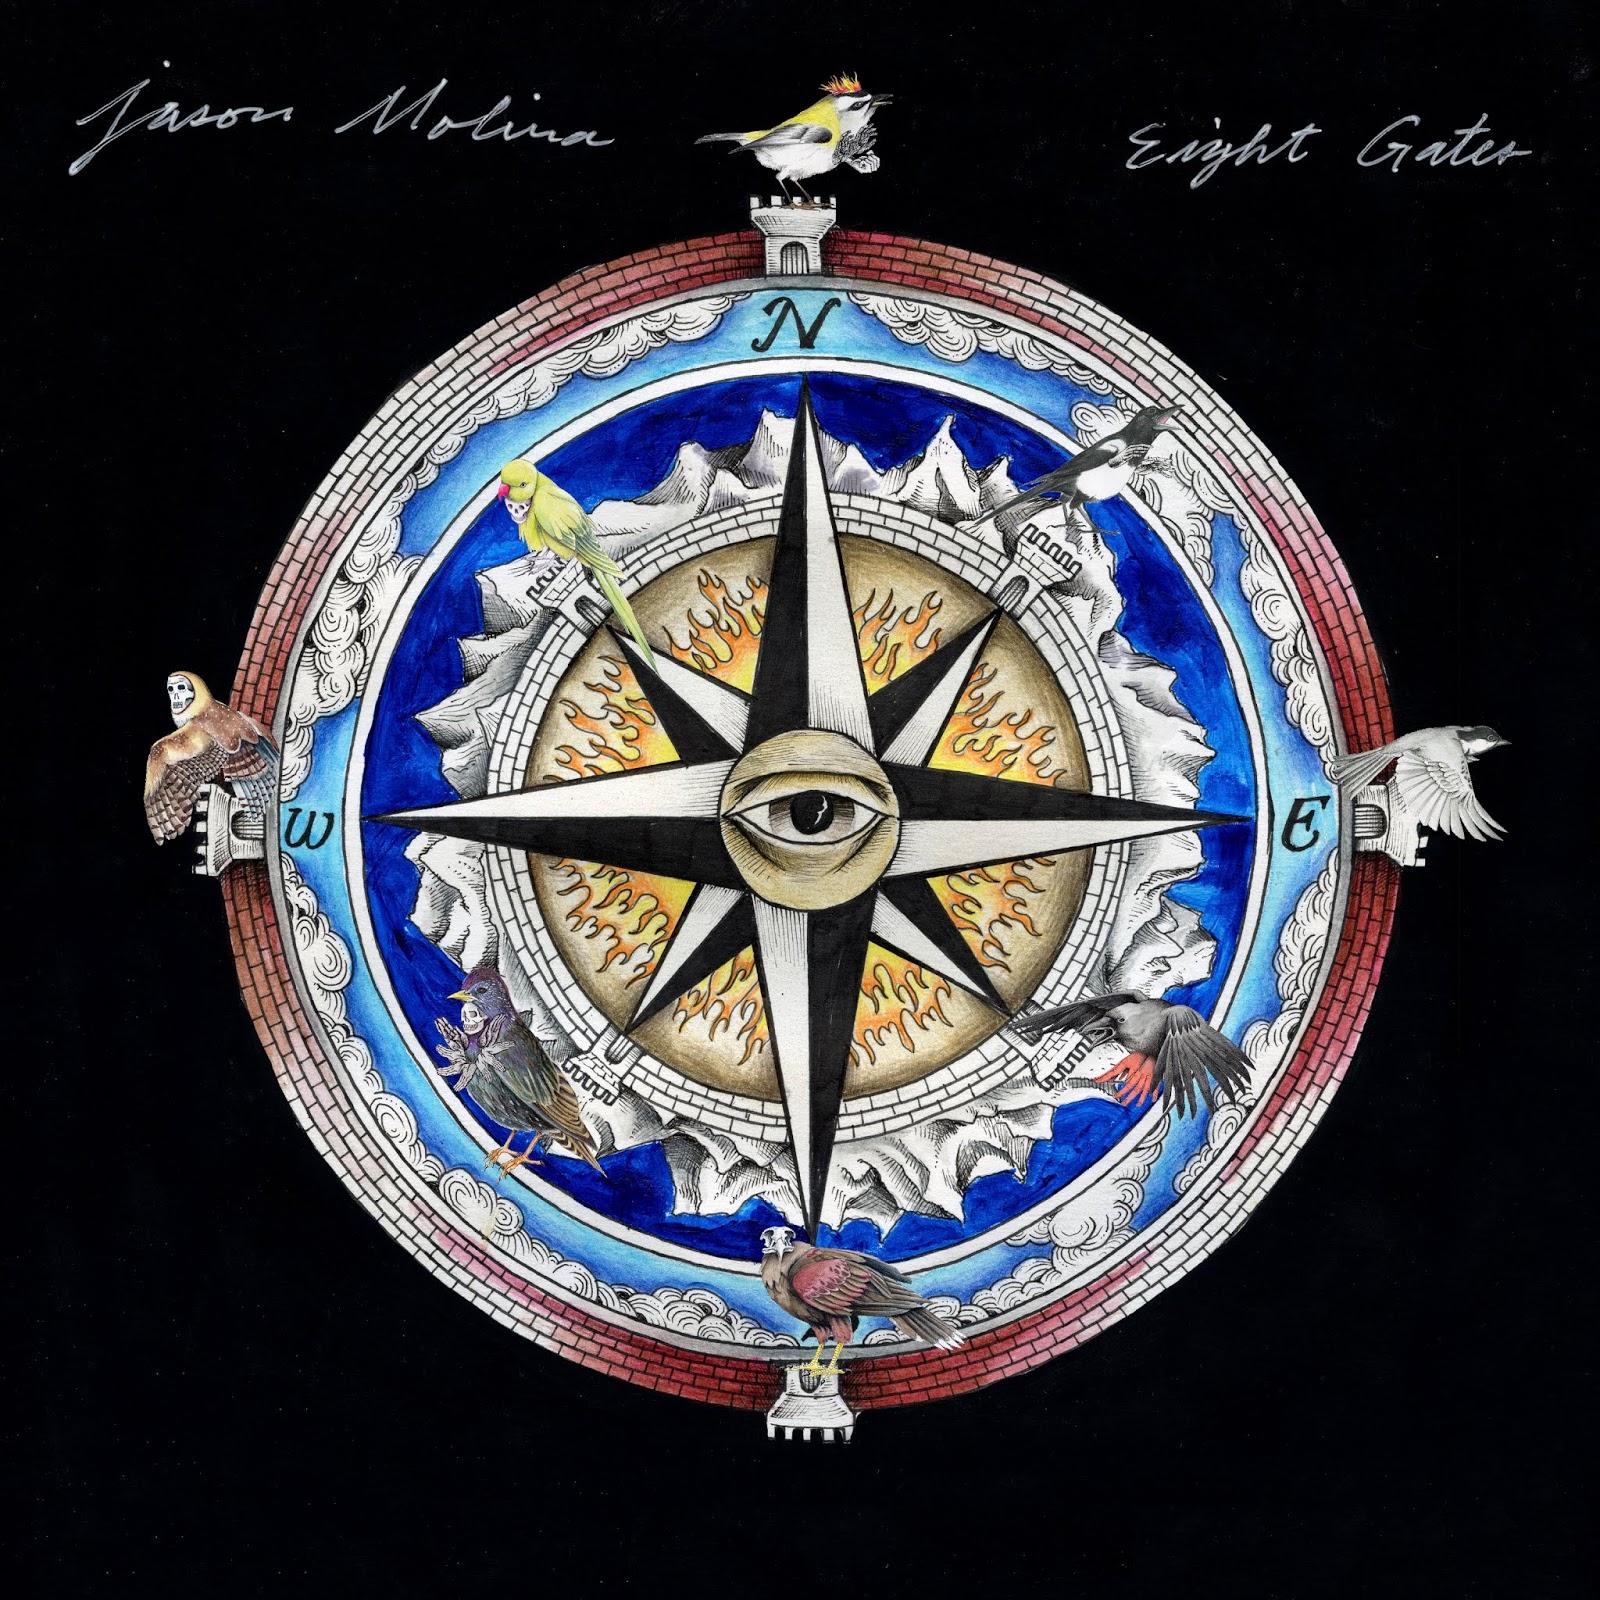 Jason Molina - Eight Gates (2020)